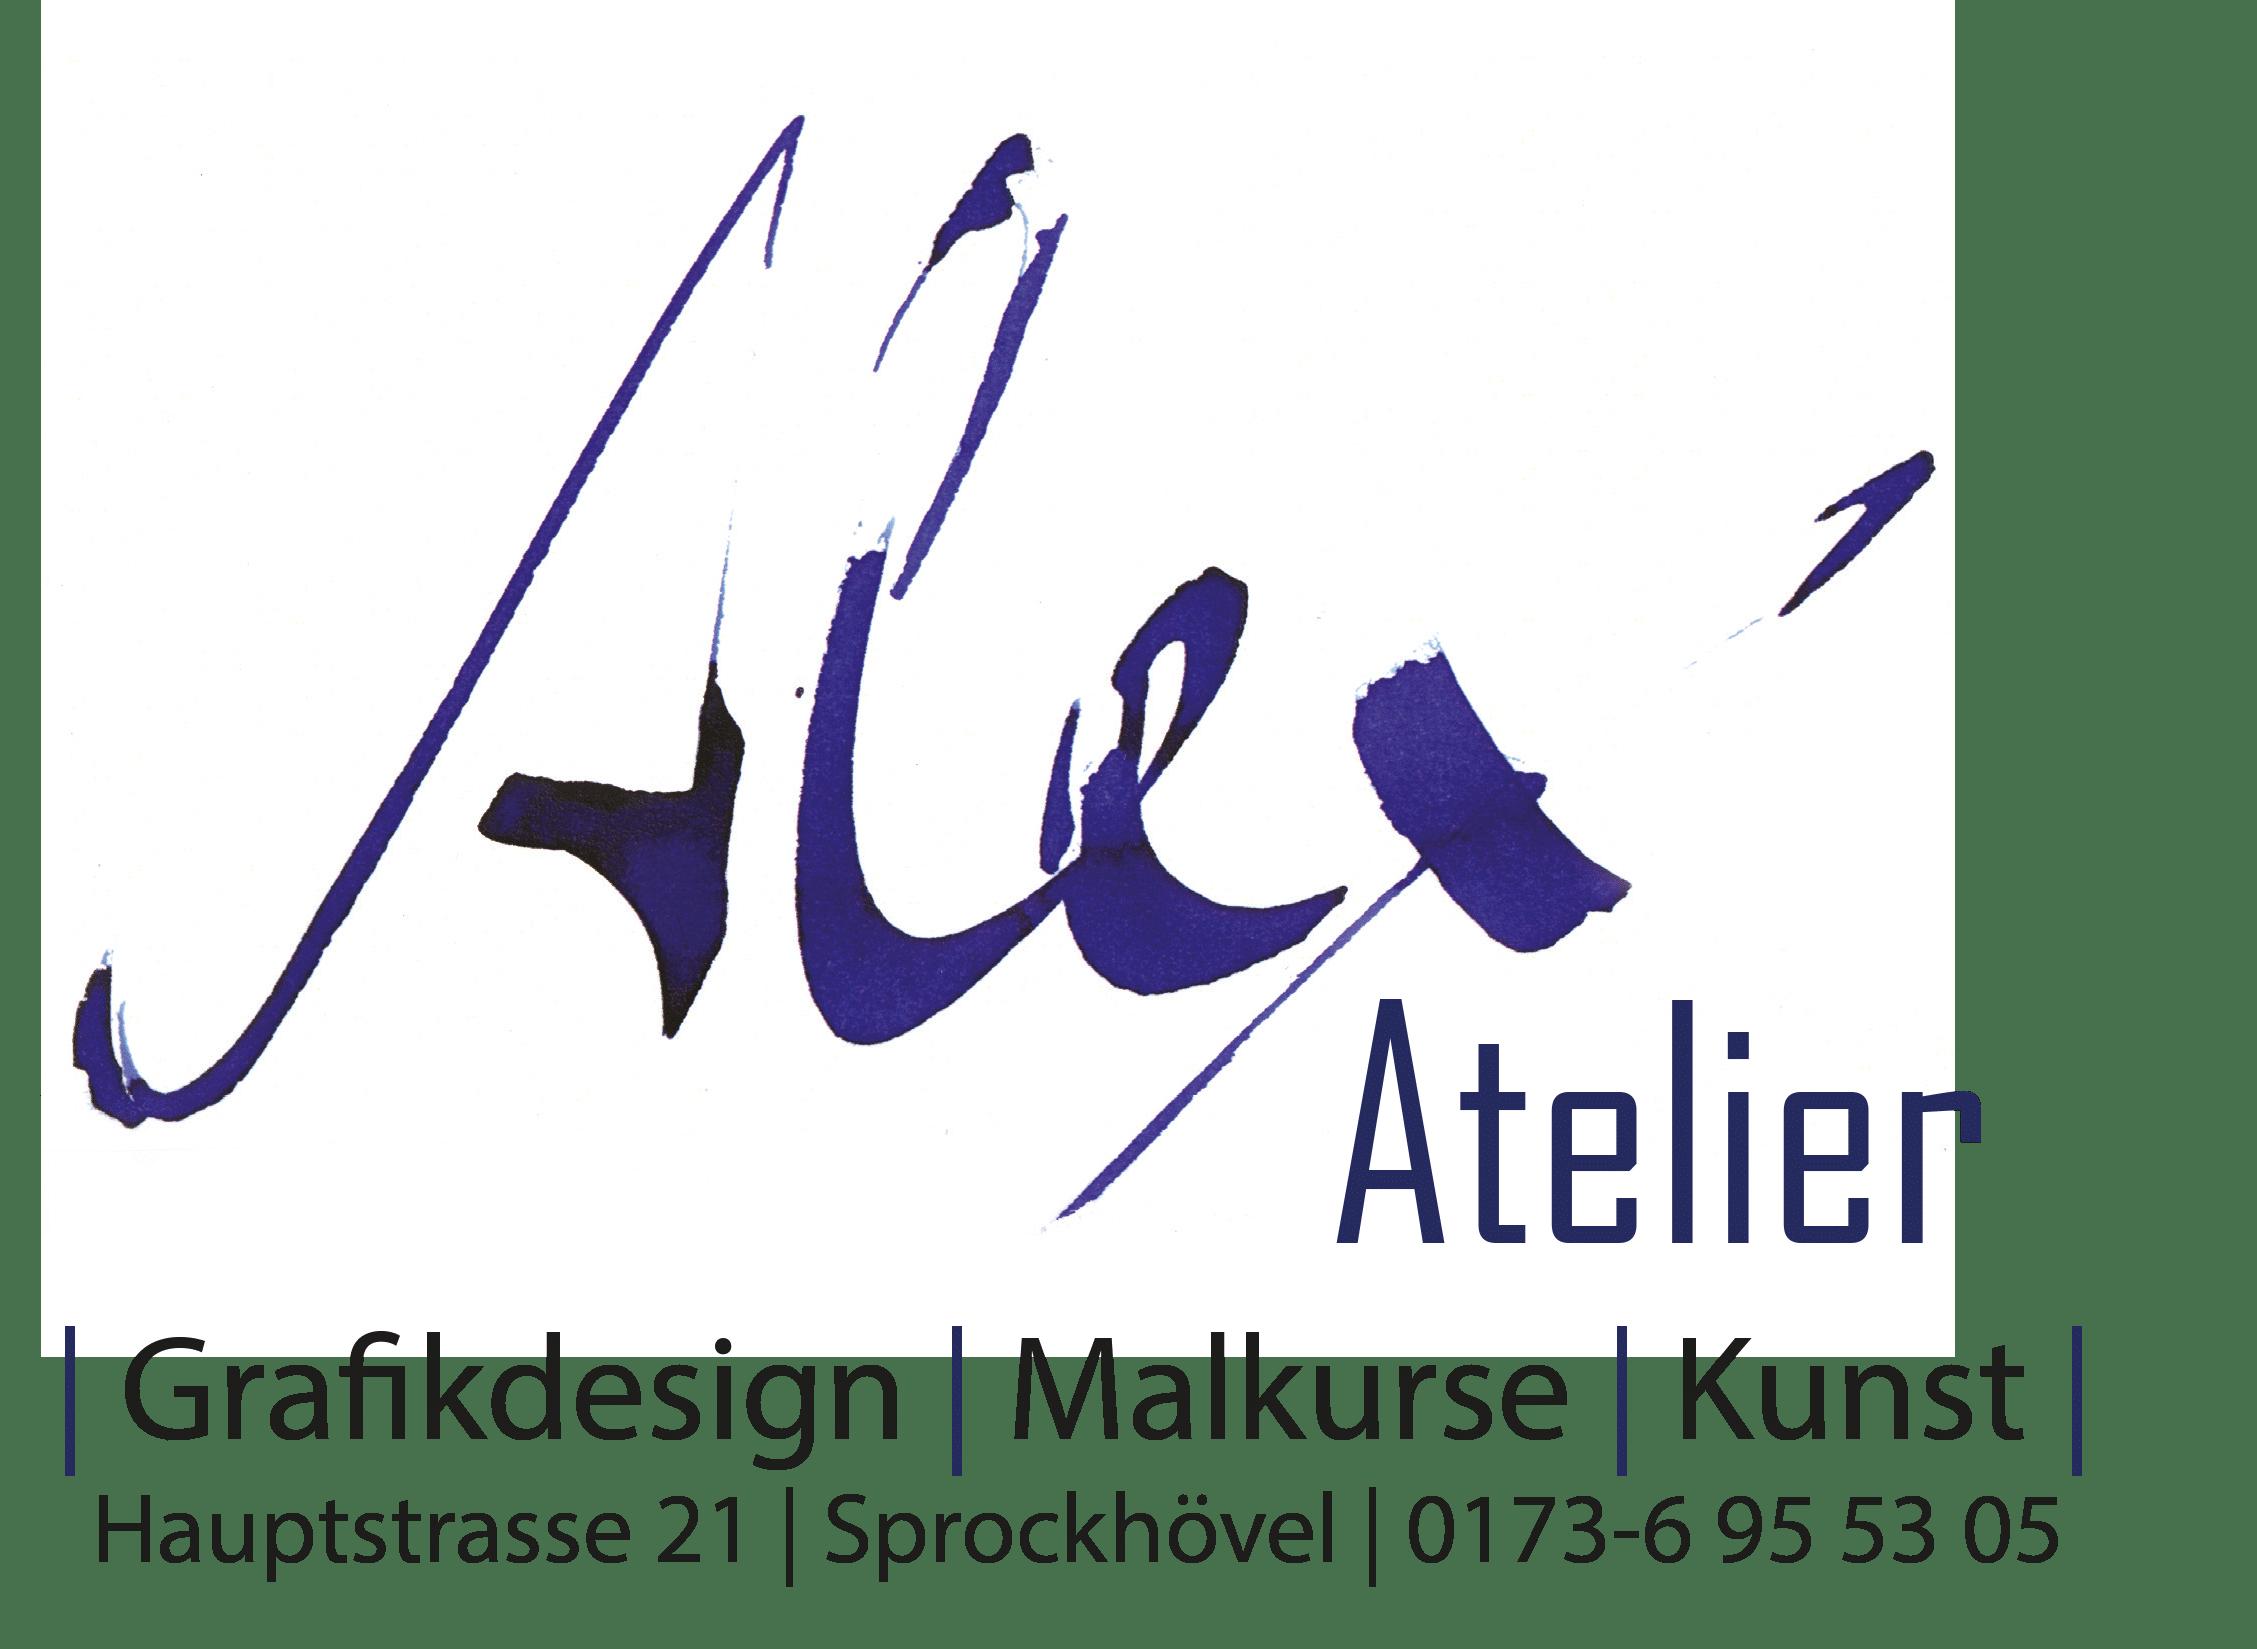 Alex Atelier